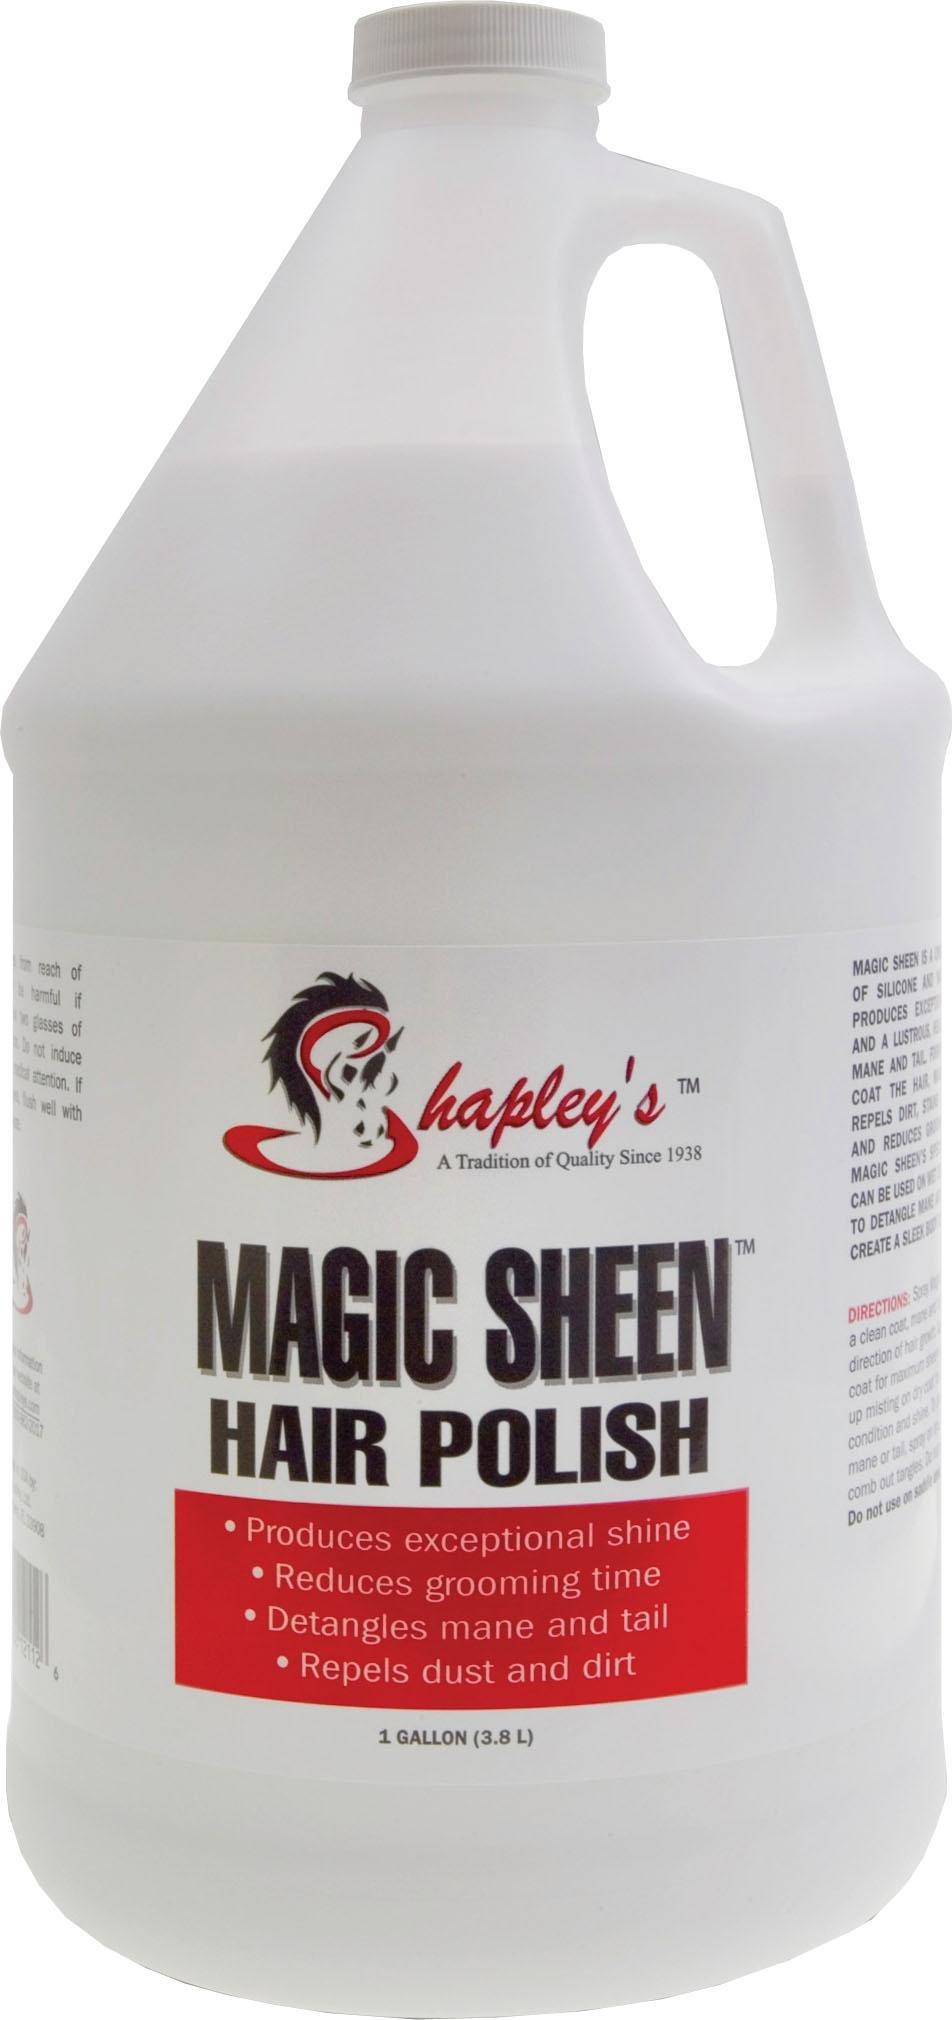 Magic Sheen Hair Polish For Horses